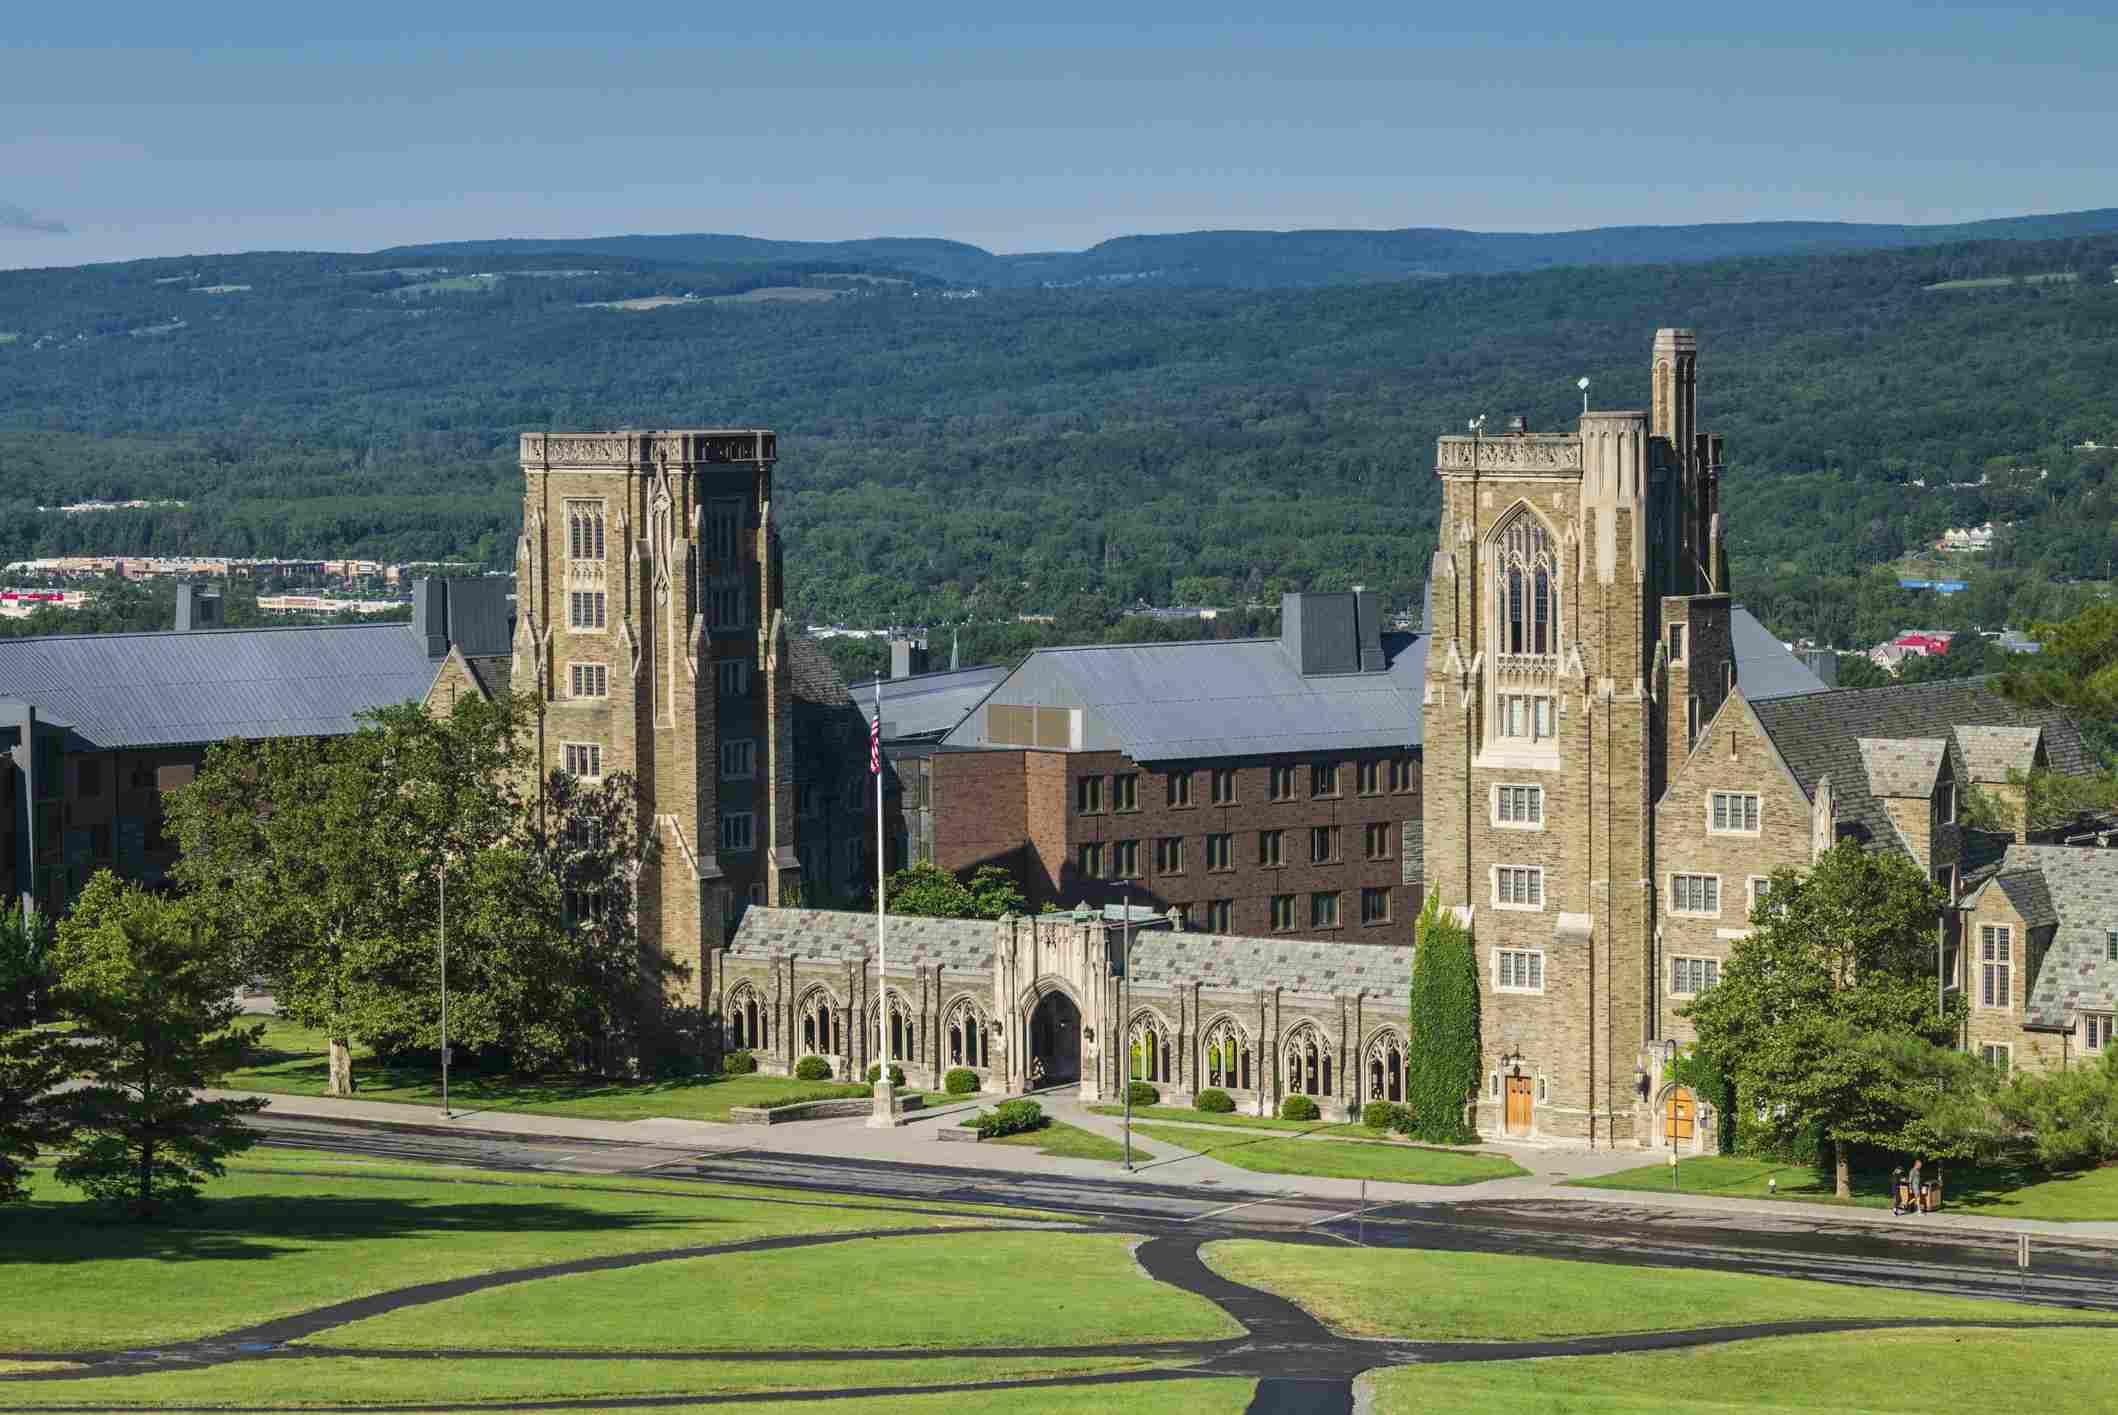 USA, New York, Ithaca, Cornell University